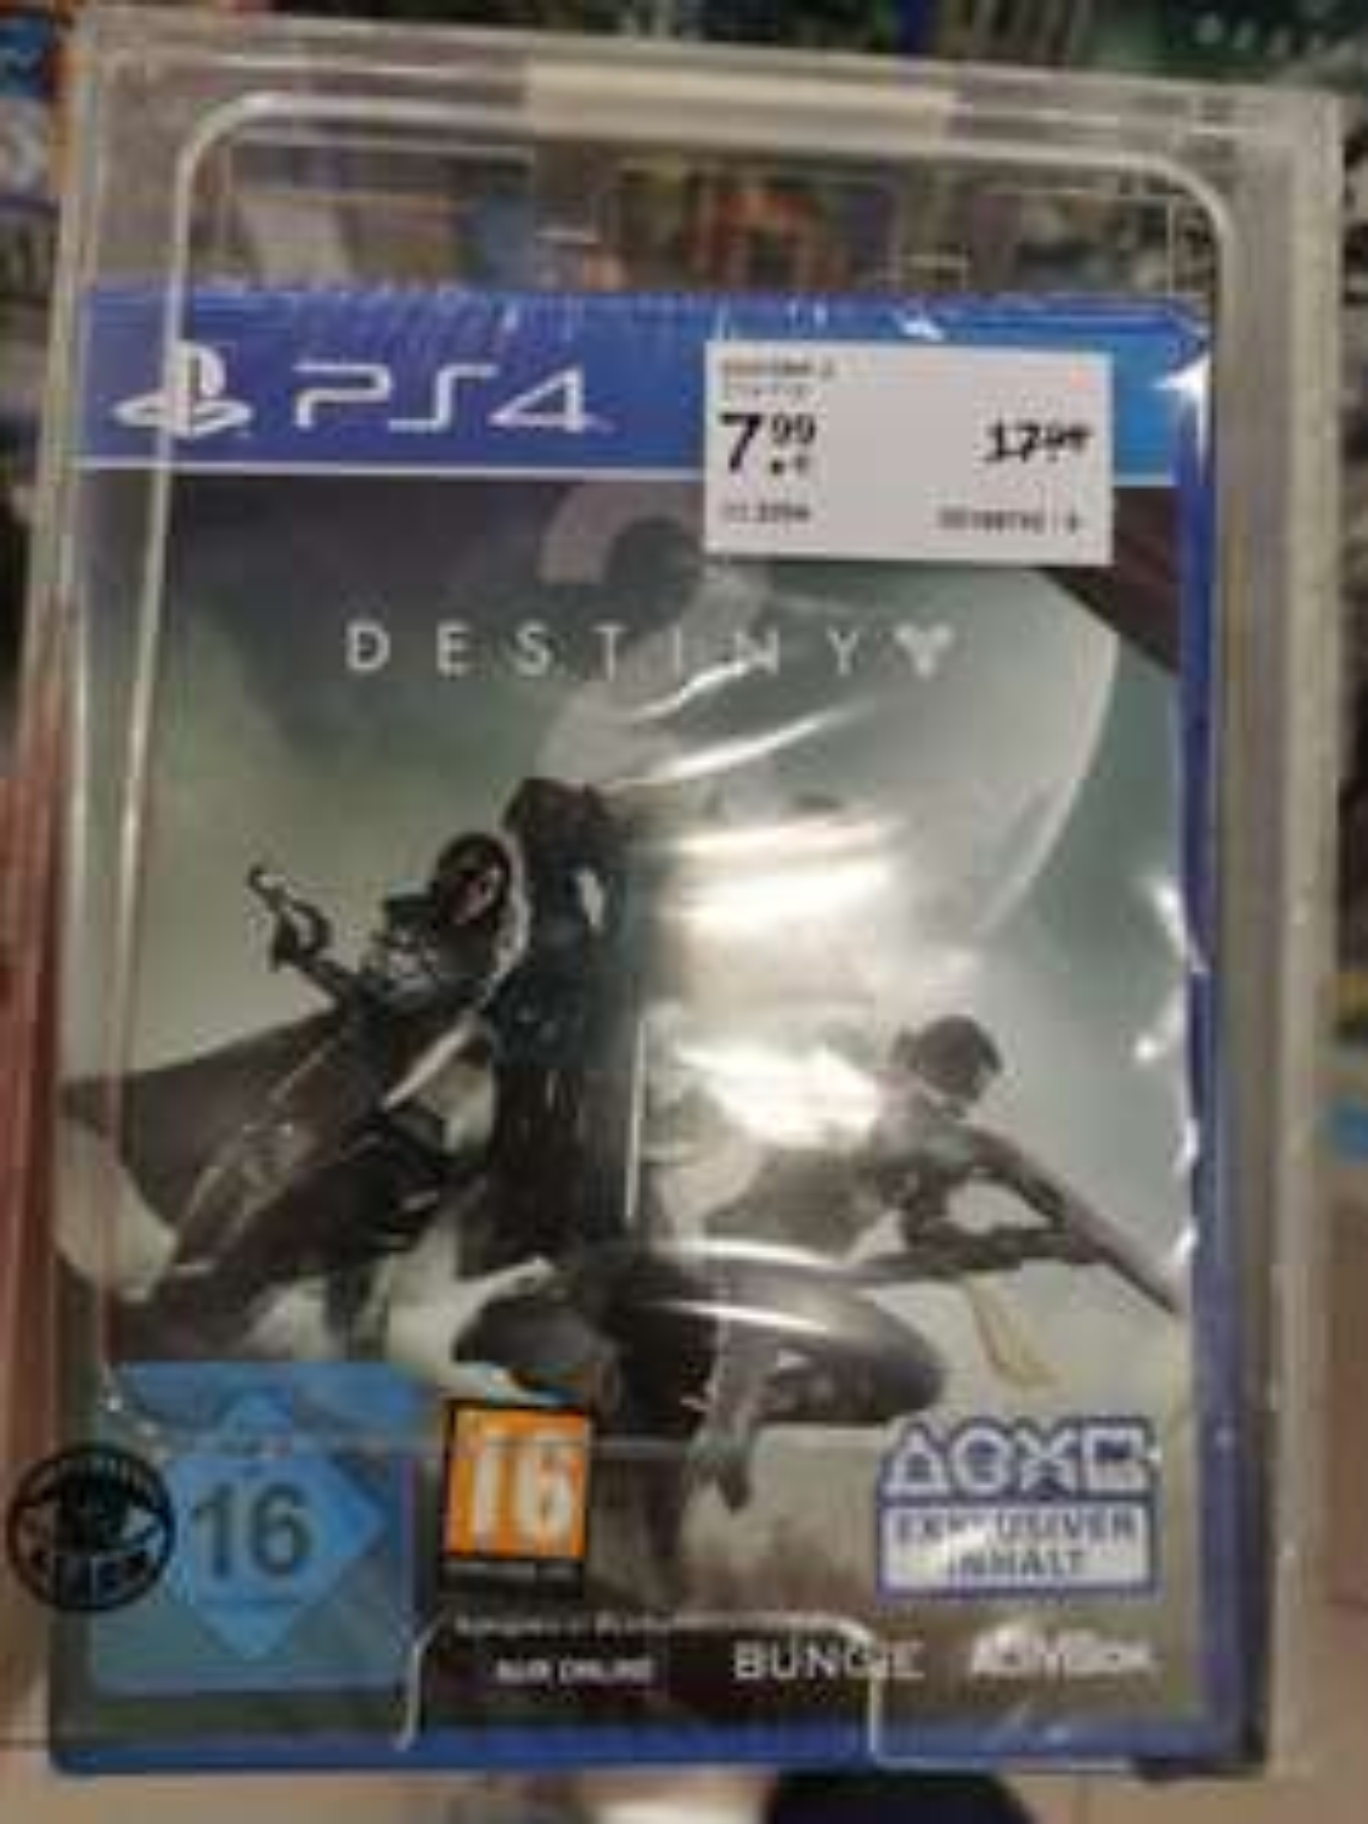 [Müller] Destiny 2. Preis inkl. 20% Aktion PS4